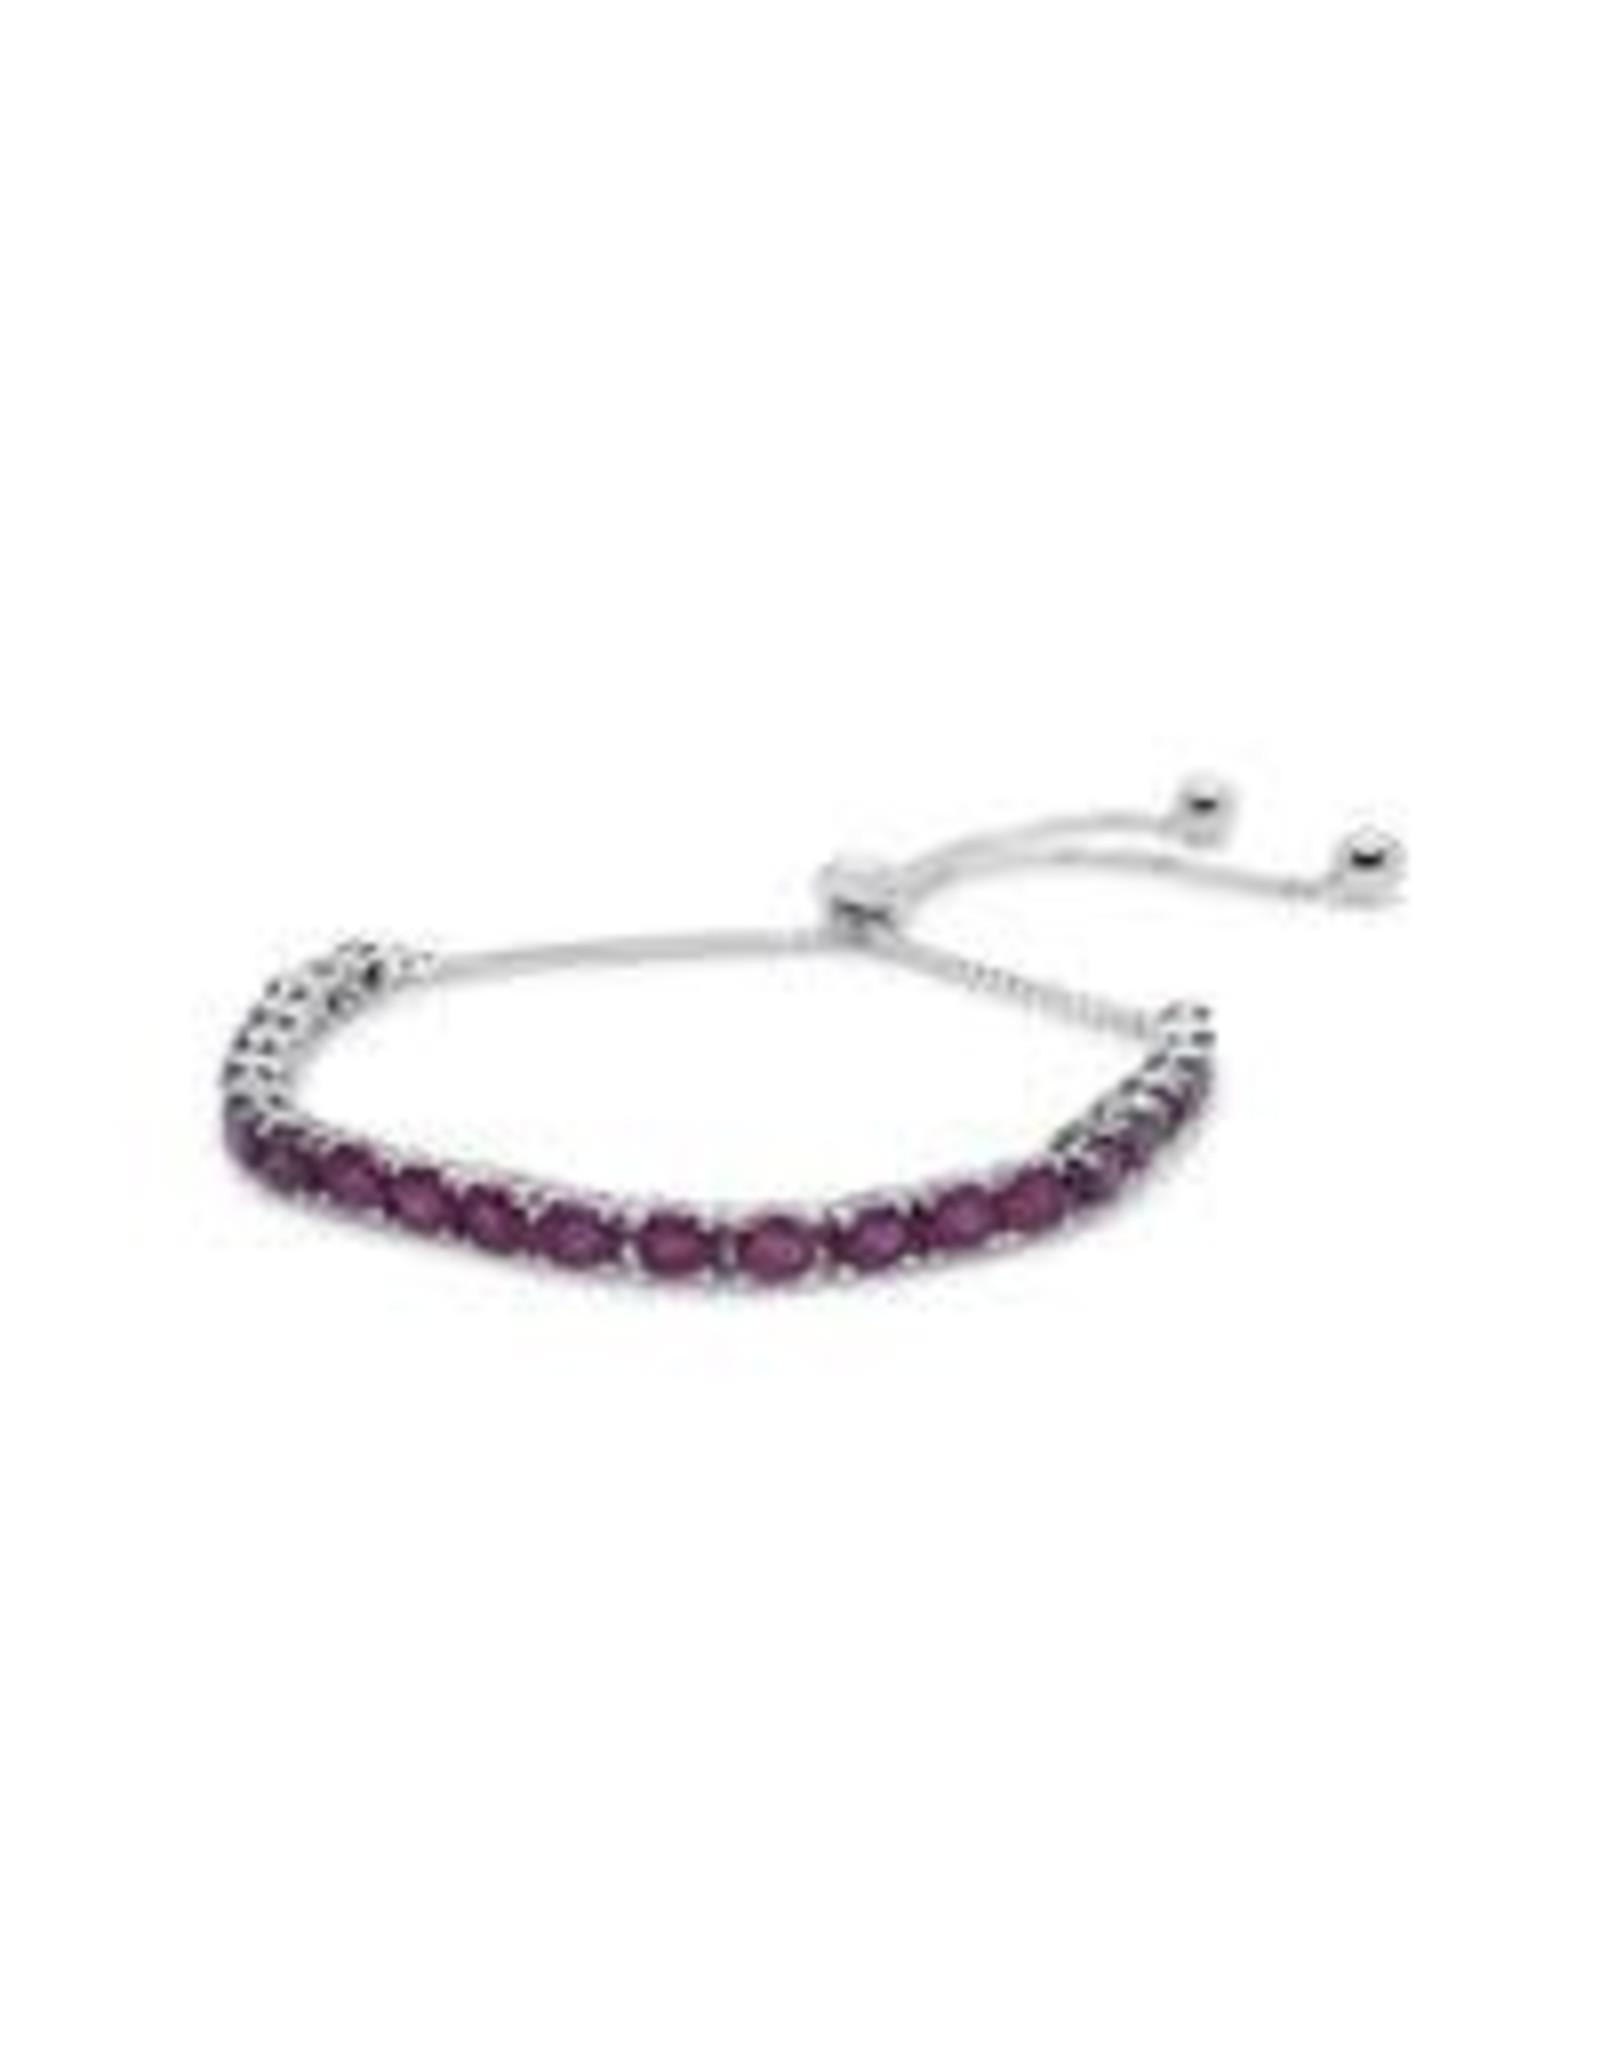 Stones & Silver Ruby Gemstone Lariat Bracelet (925 S/S)